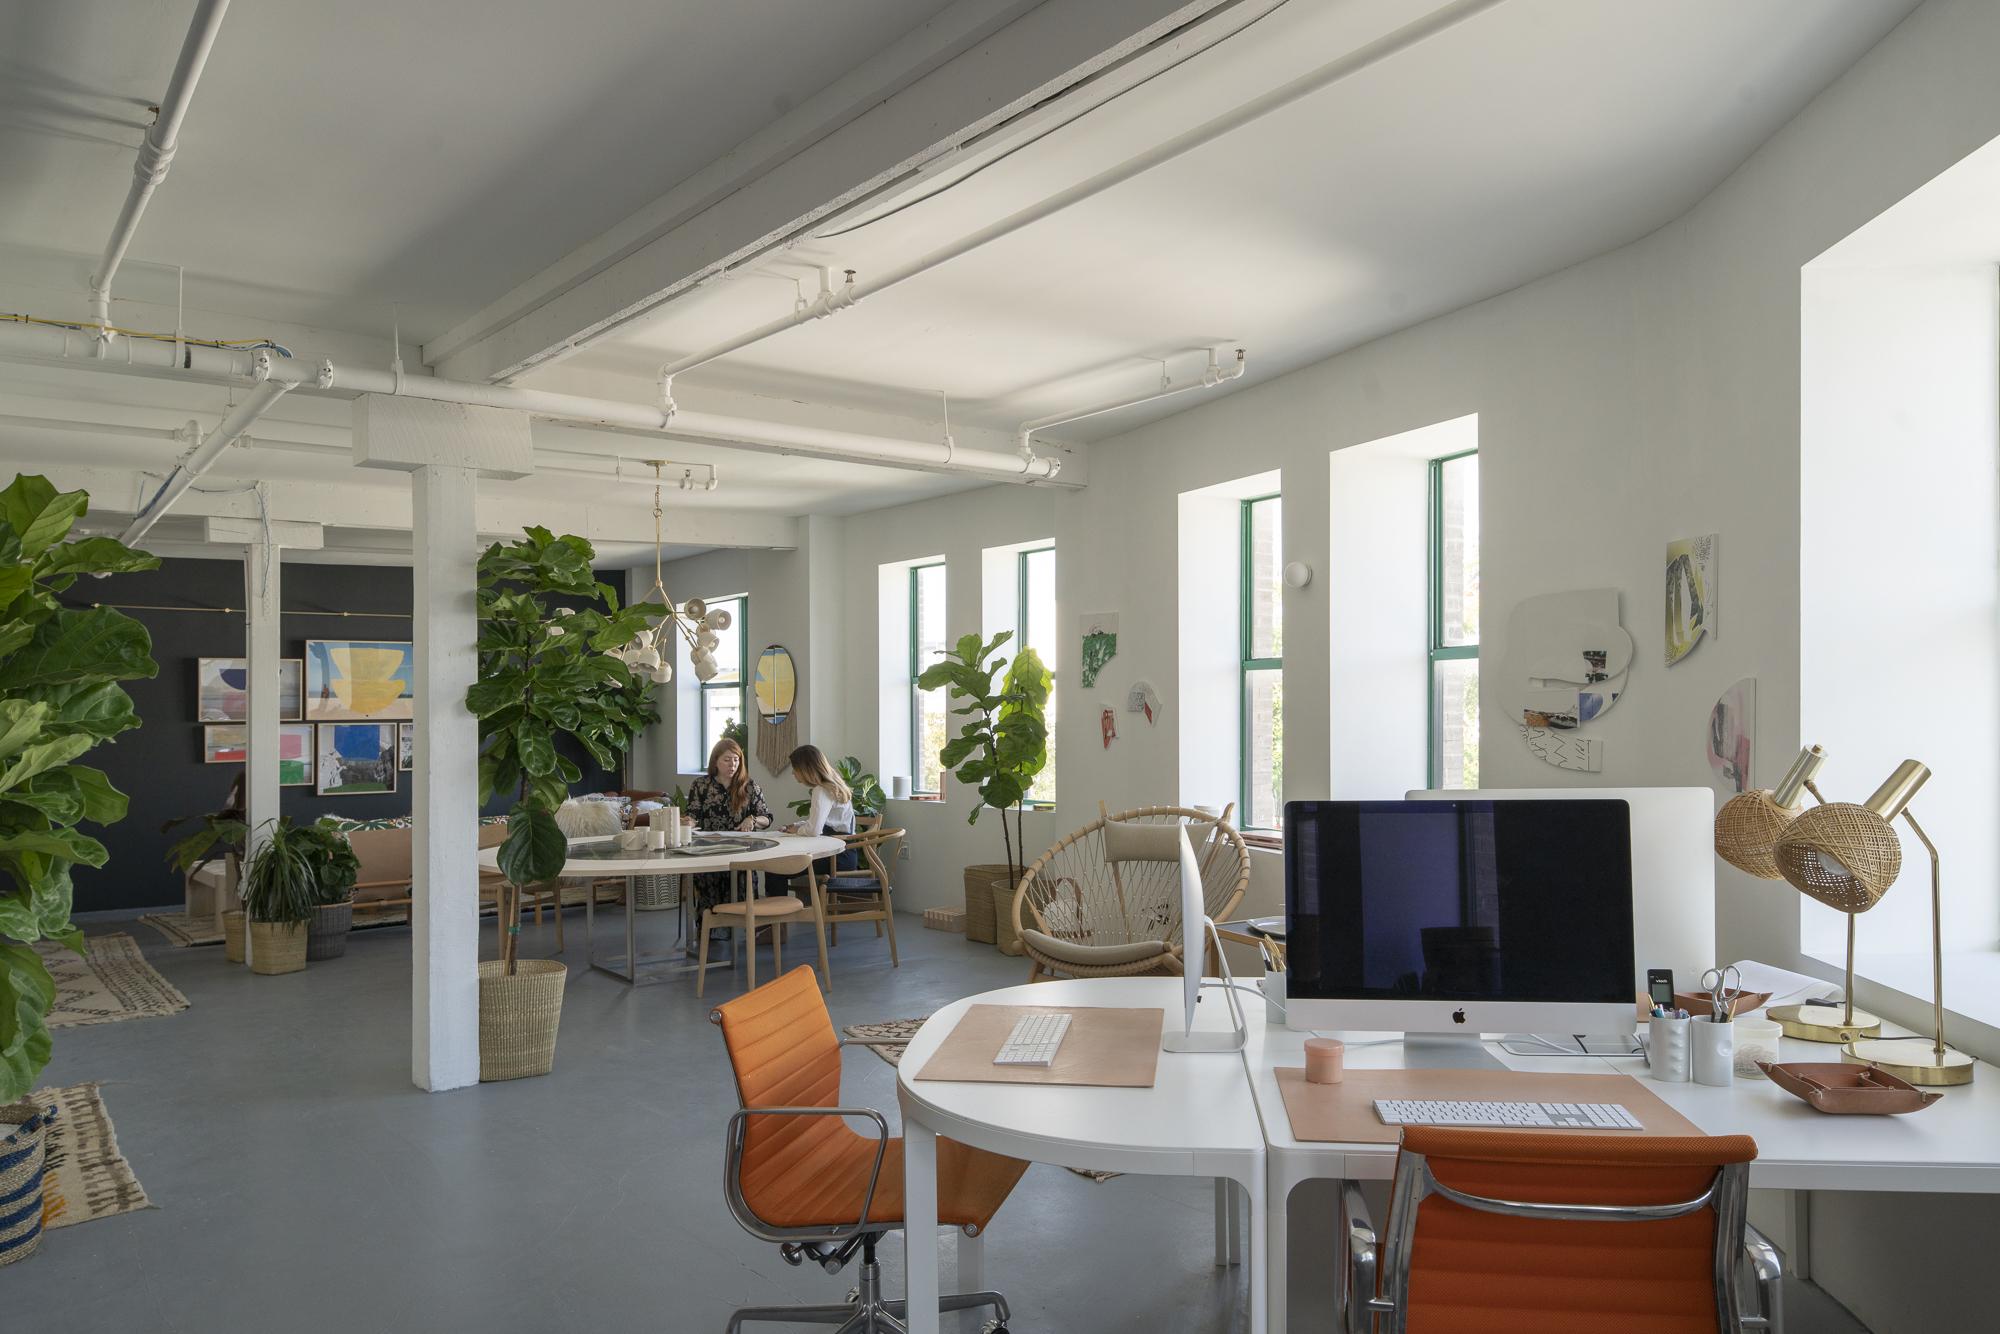 Bunsa_Office-3729.jpg